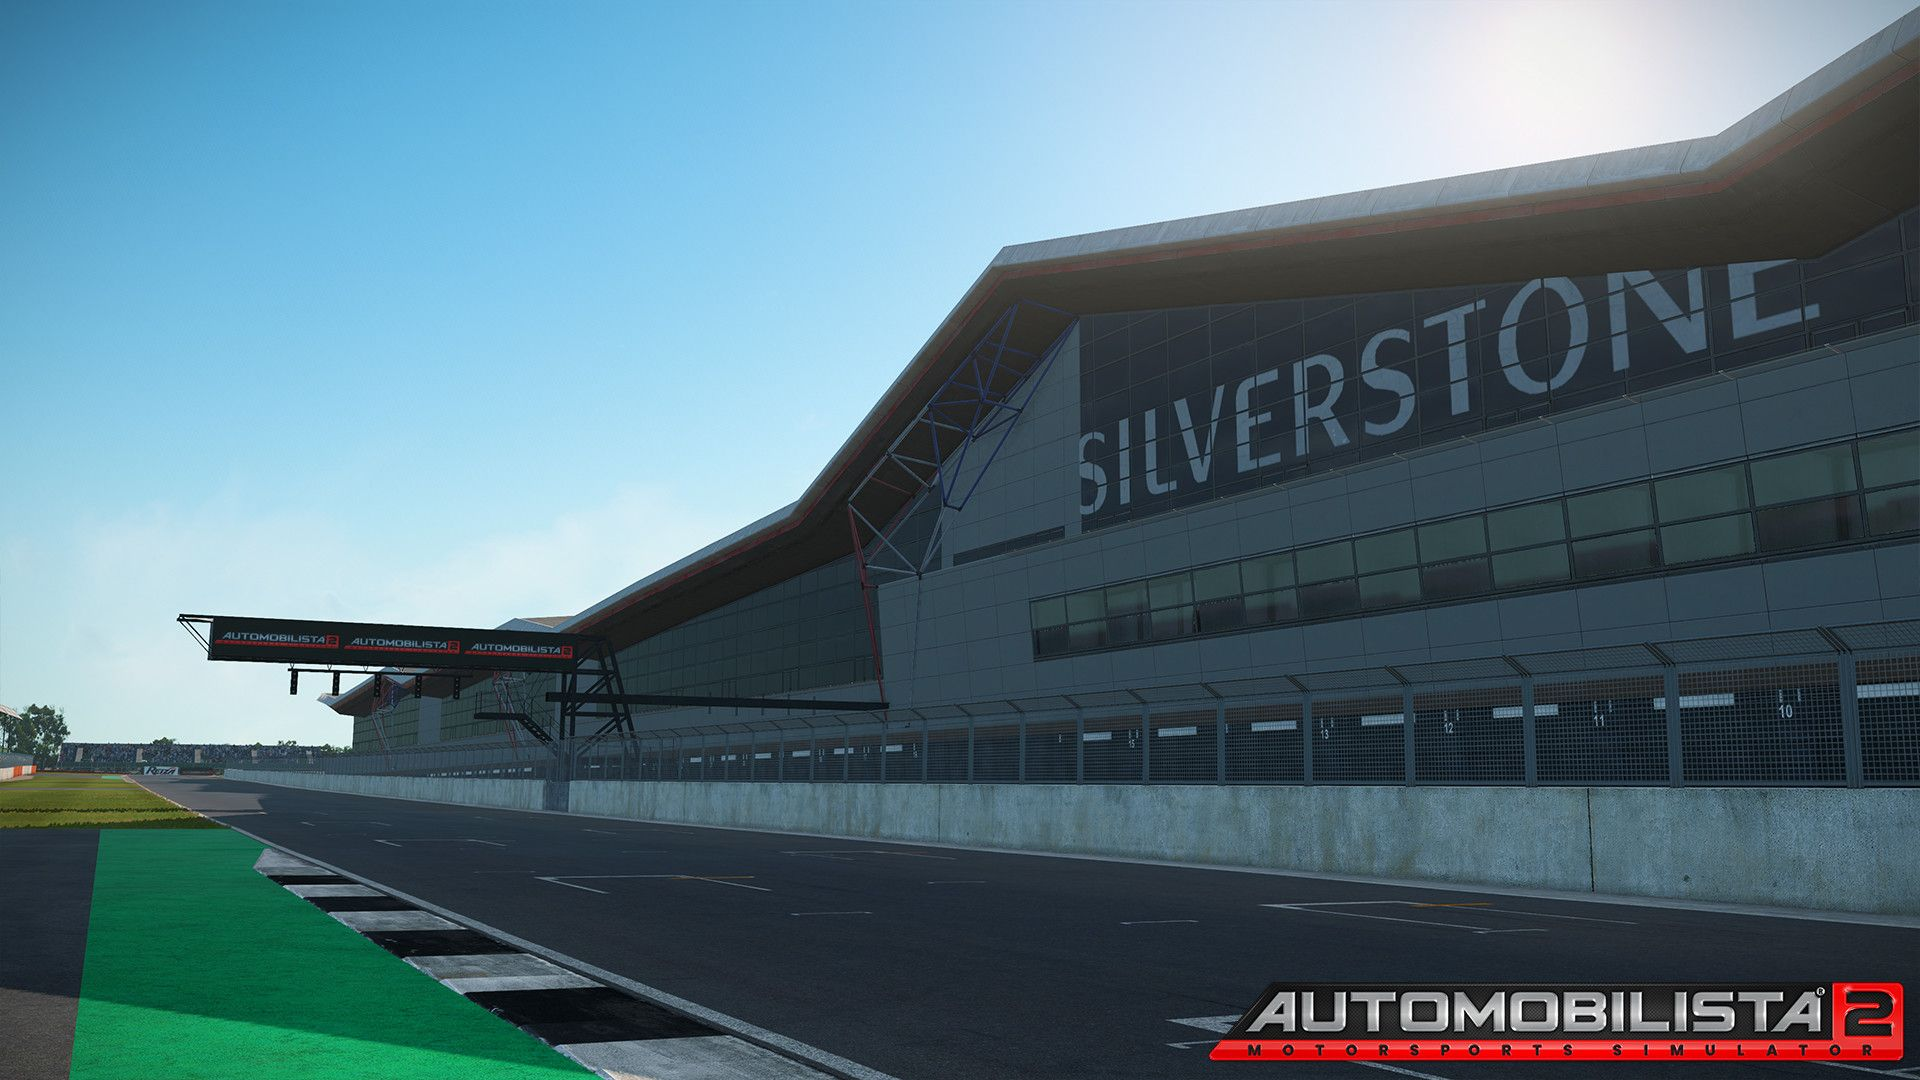 Automobilista 2 - Silverstone Pack